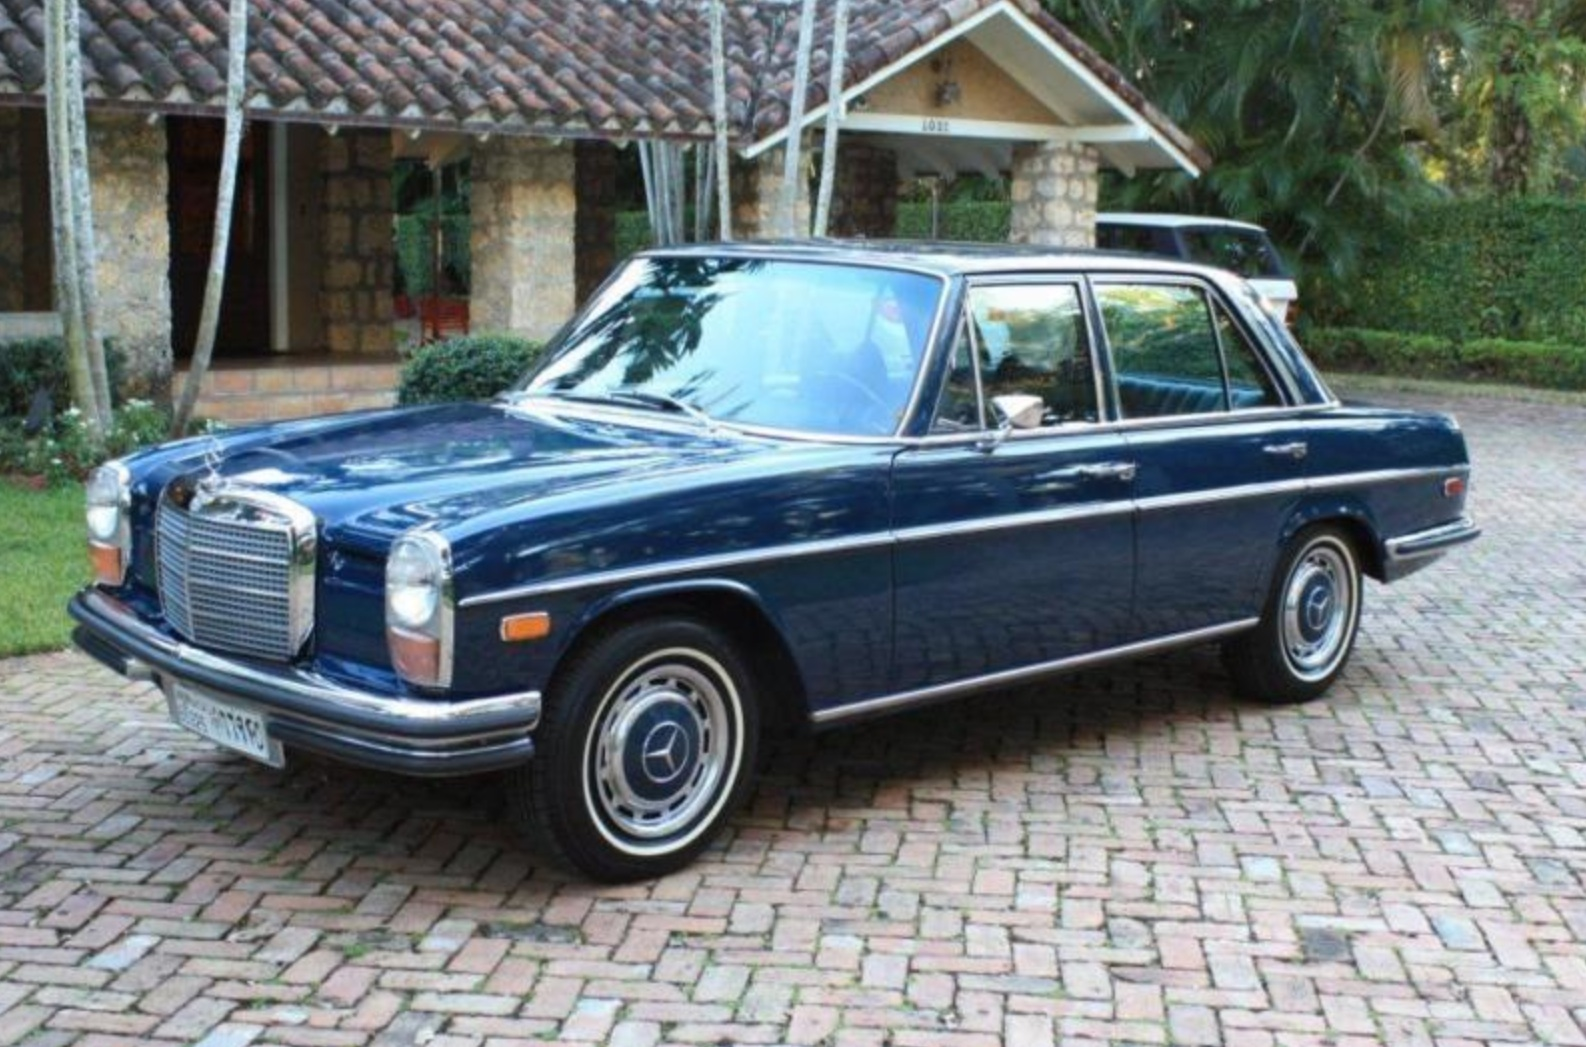 Mercedes-Benz W114 1967 - 1977 Sedan #1